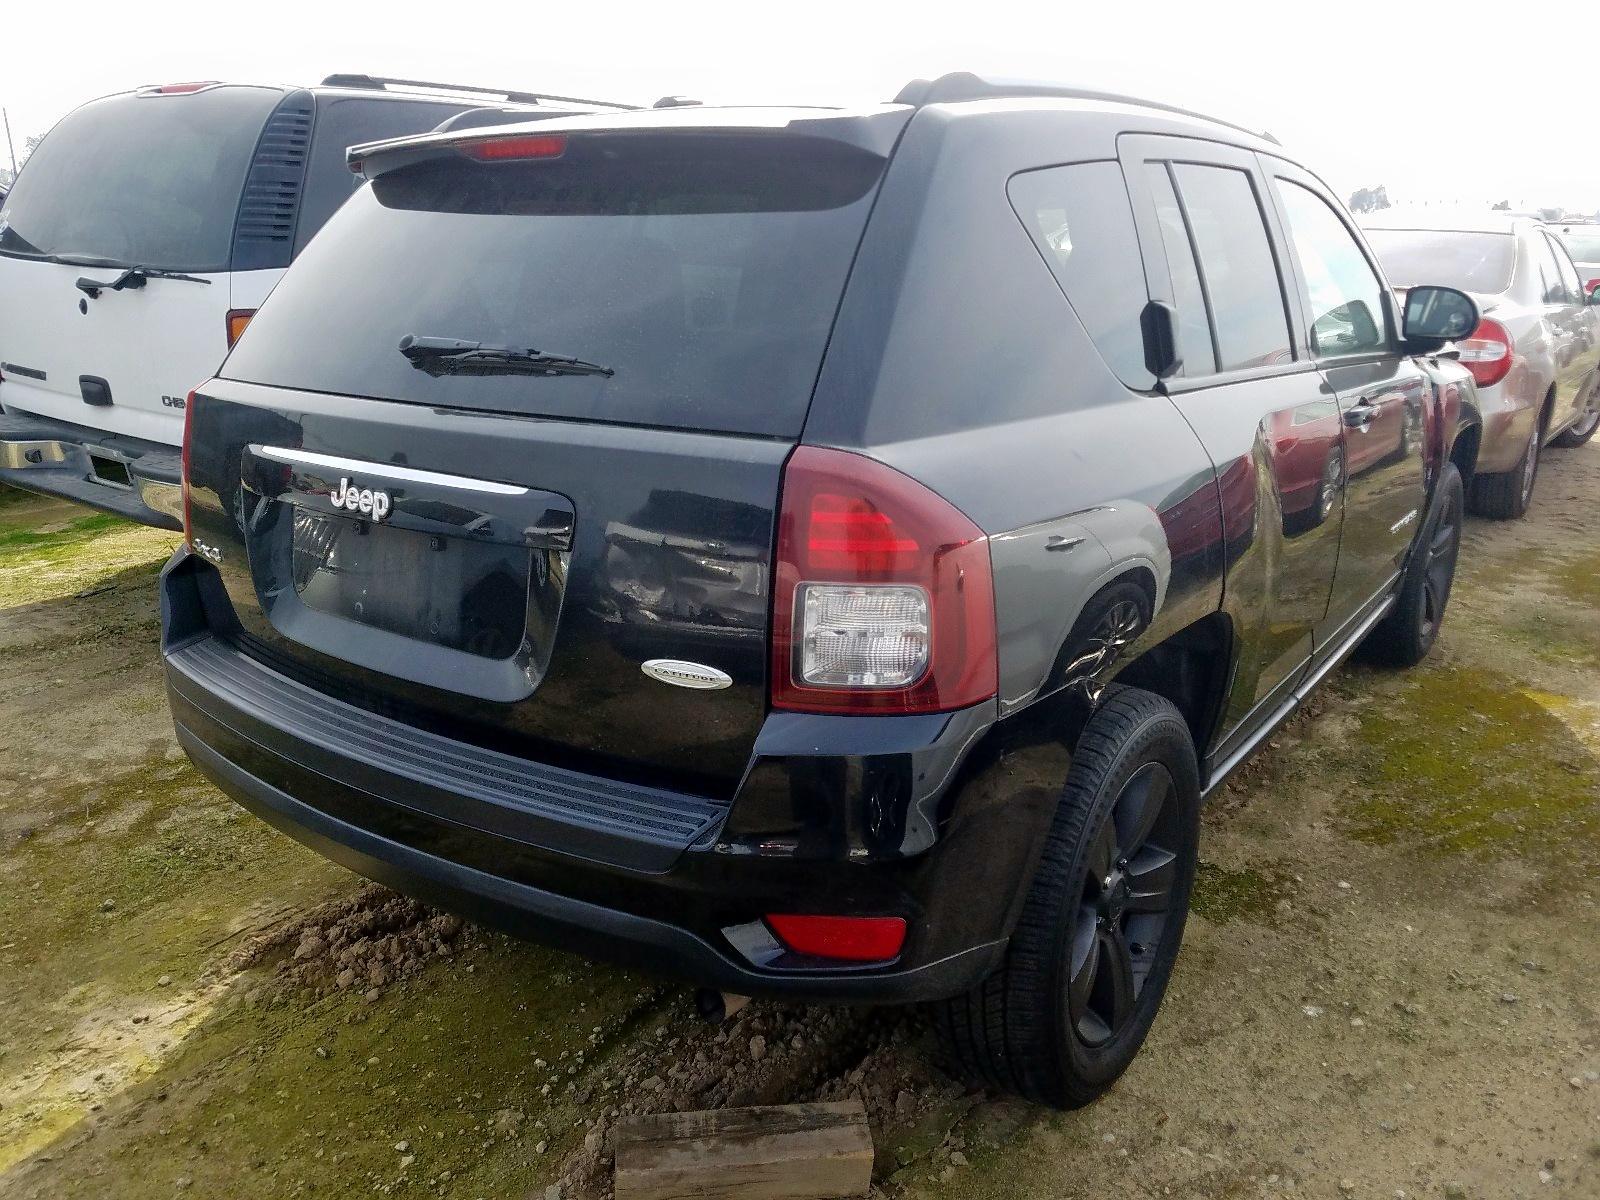 1C4NJDEB5GD733149 - 2016 Jeep Compass La 2.4L rear view